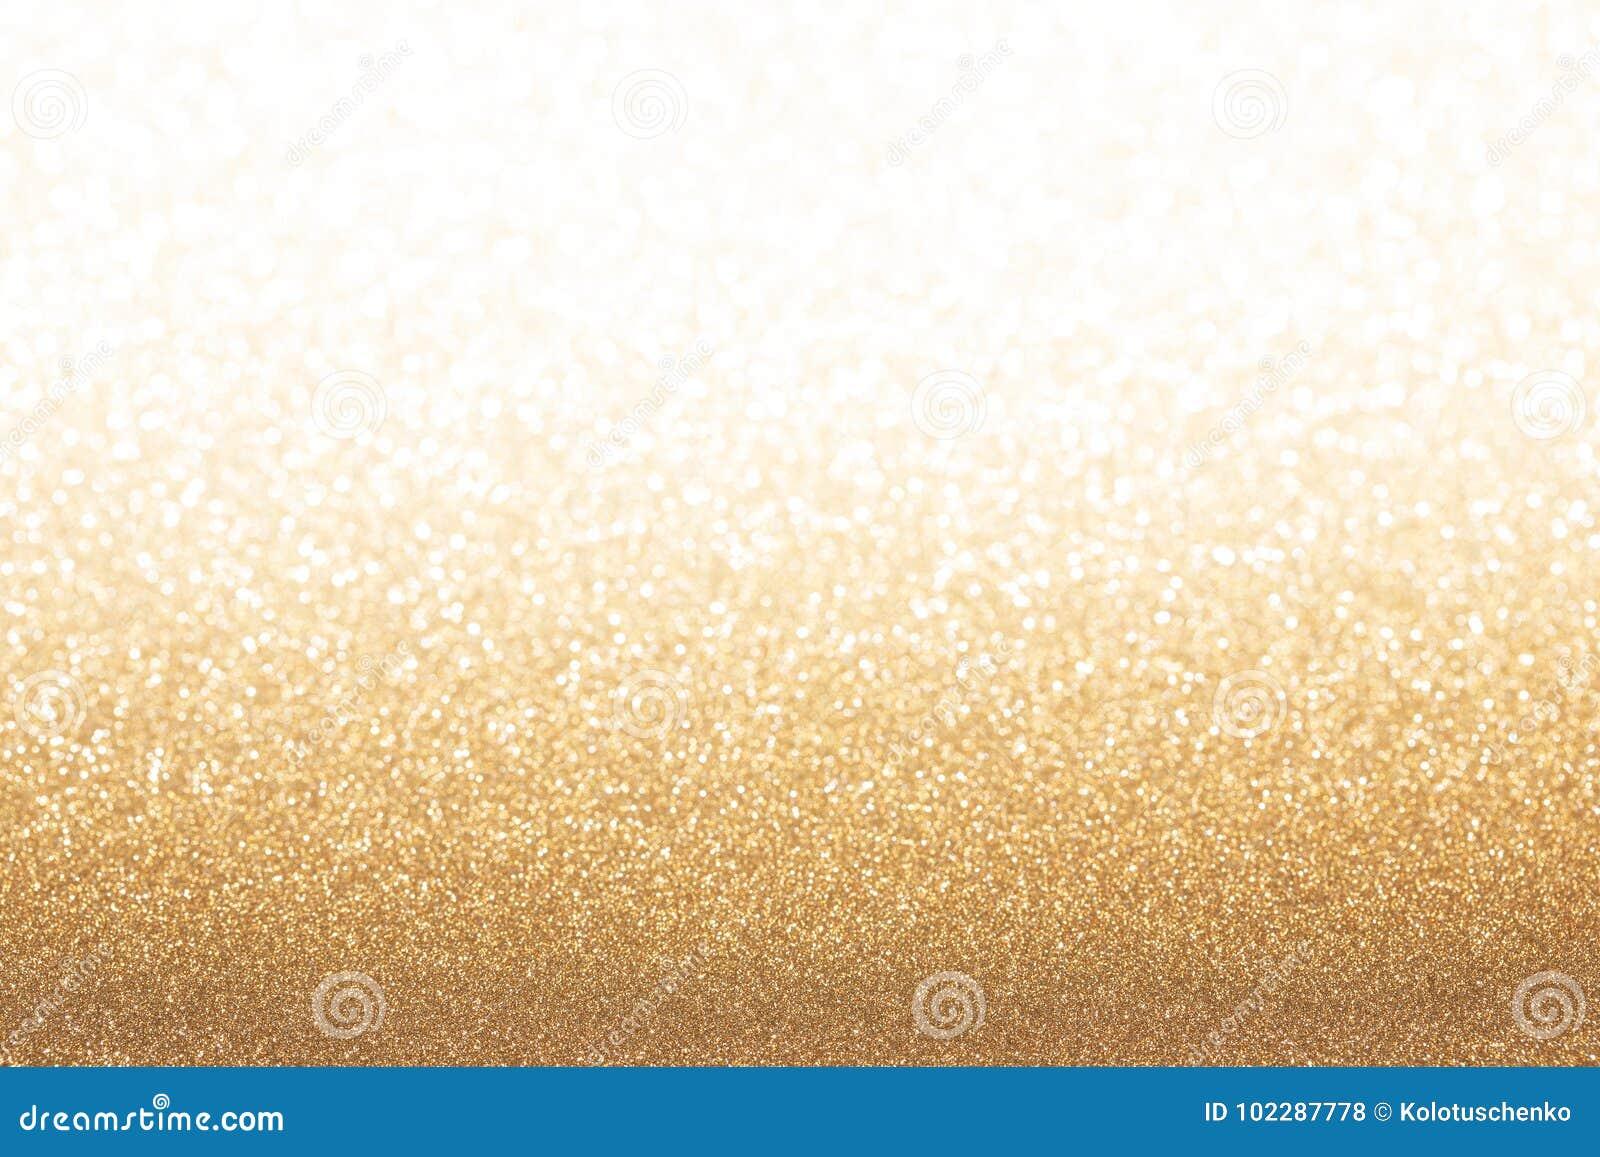 Golden yellow glitter background.